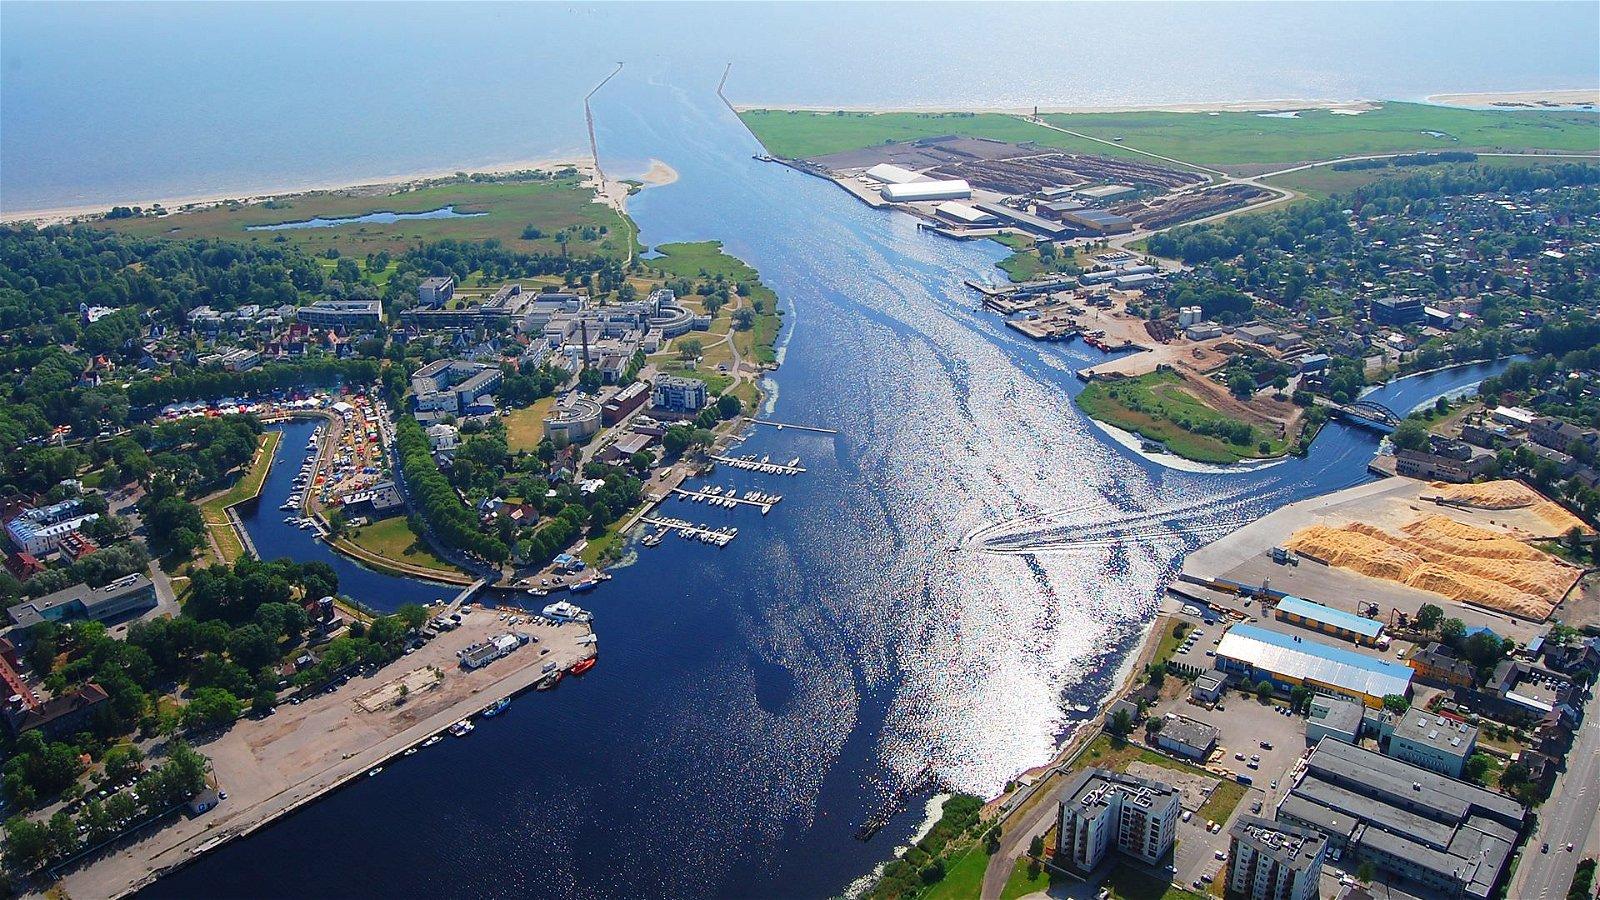 estonia-lng-center-planned-for-port-of-parnu